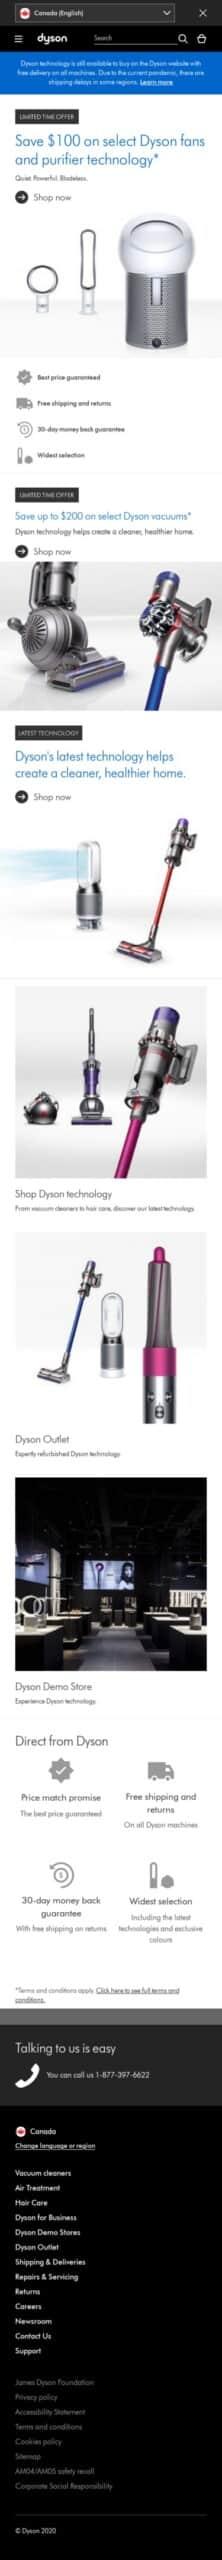 Dyson CA Coupon